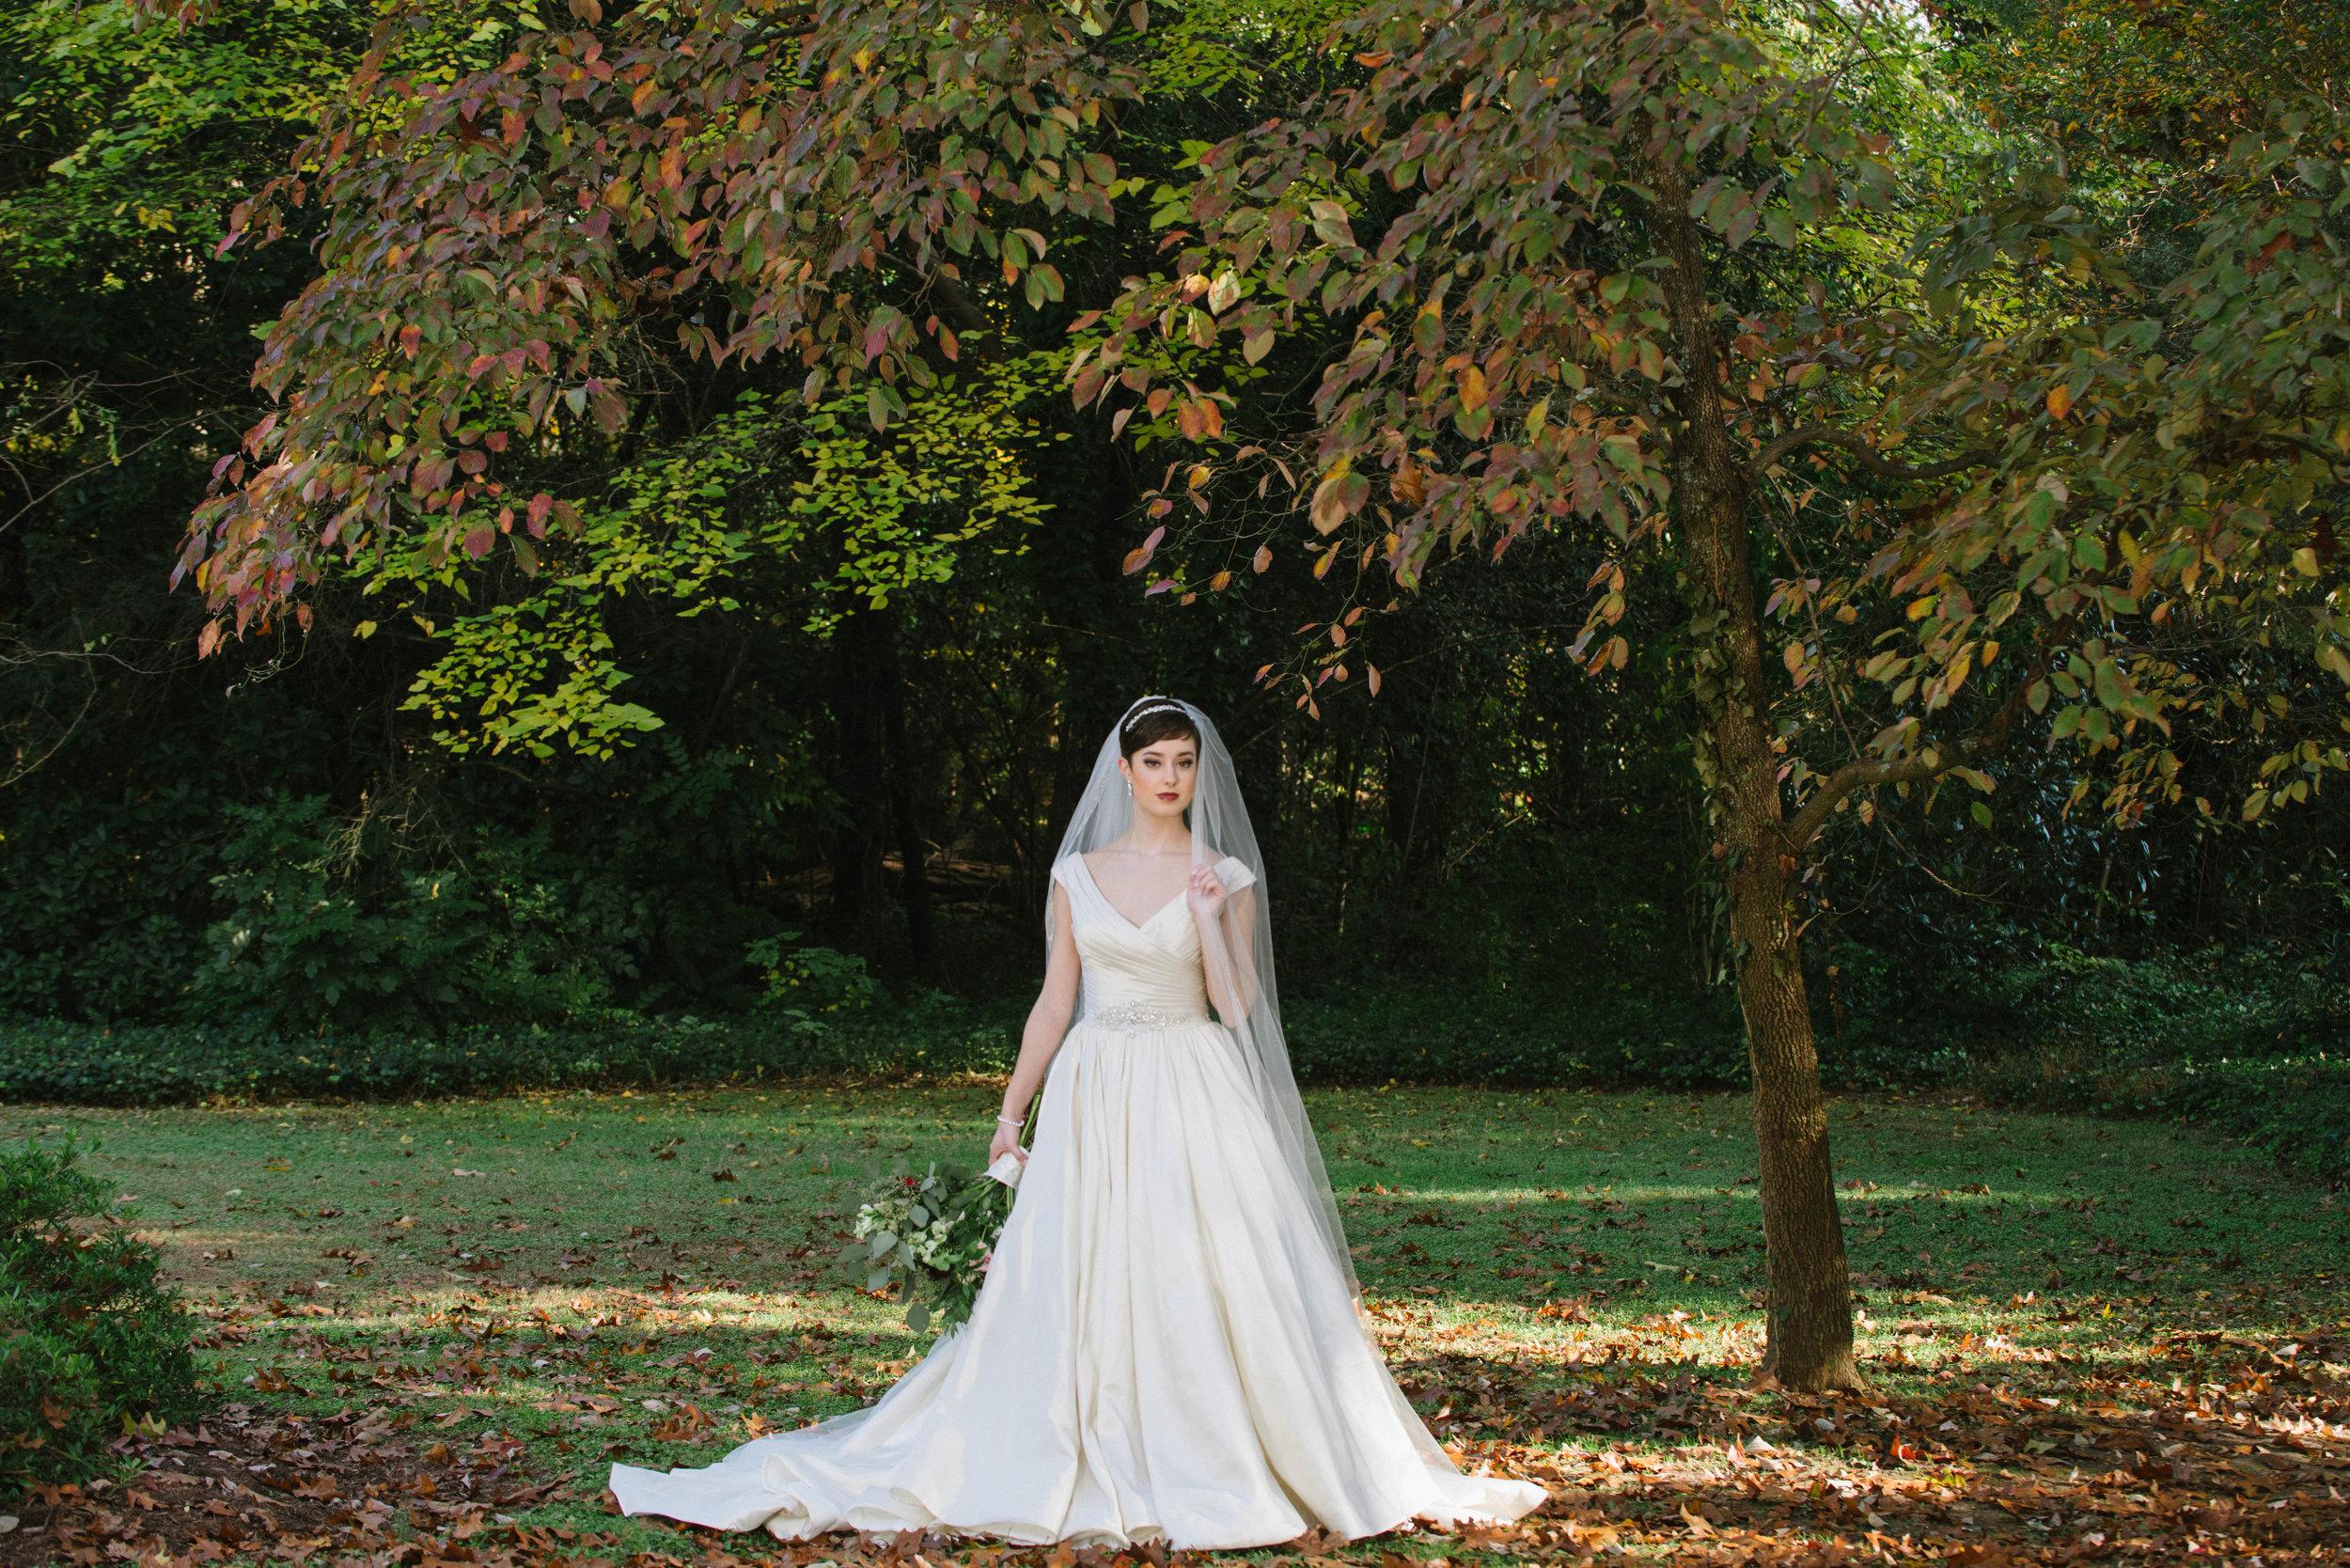 CarolineMerritt|Bridals|_Color_MiraPhotographs-48.jpg